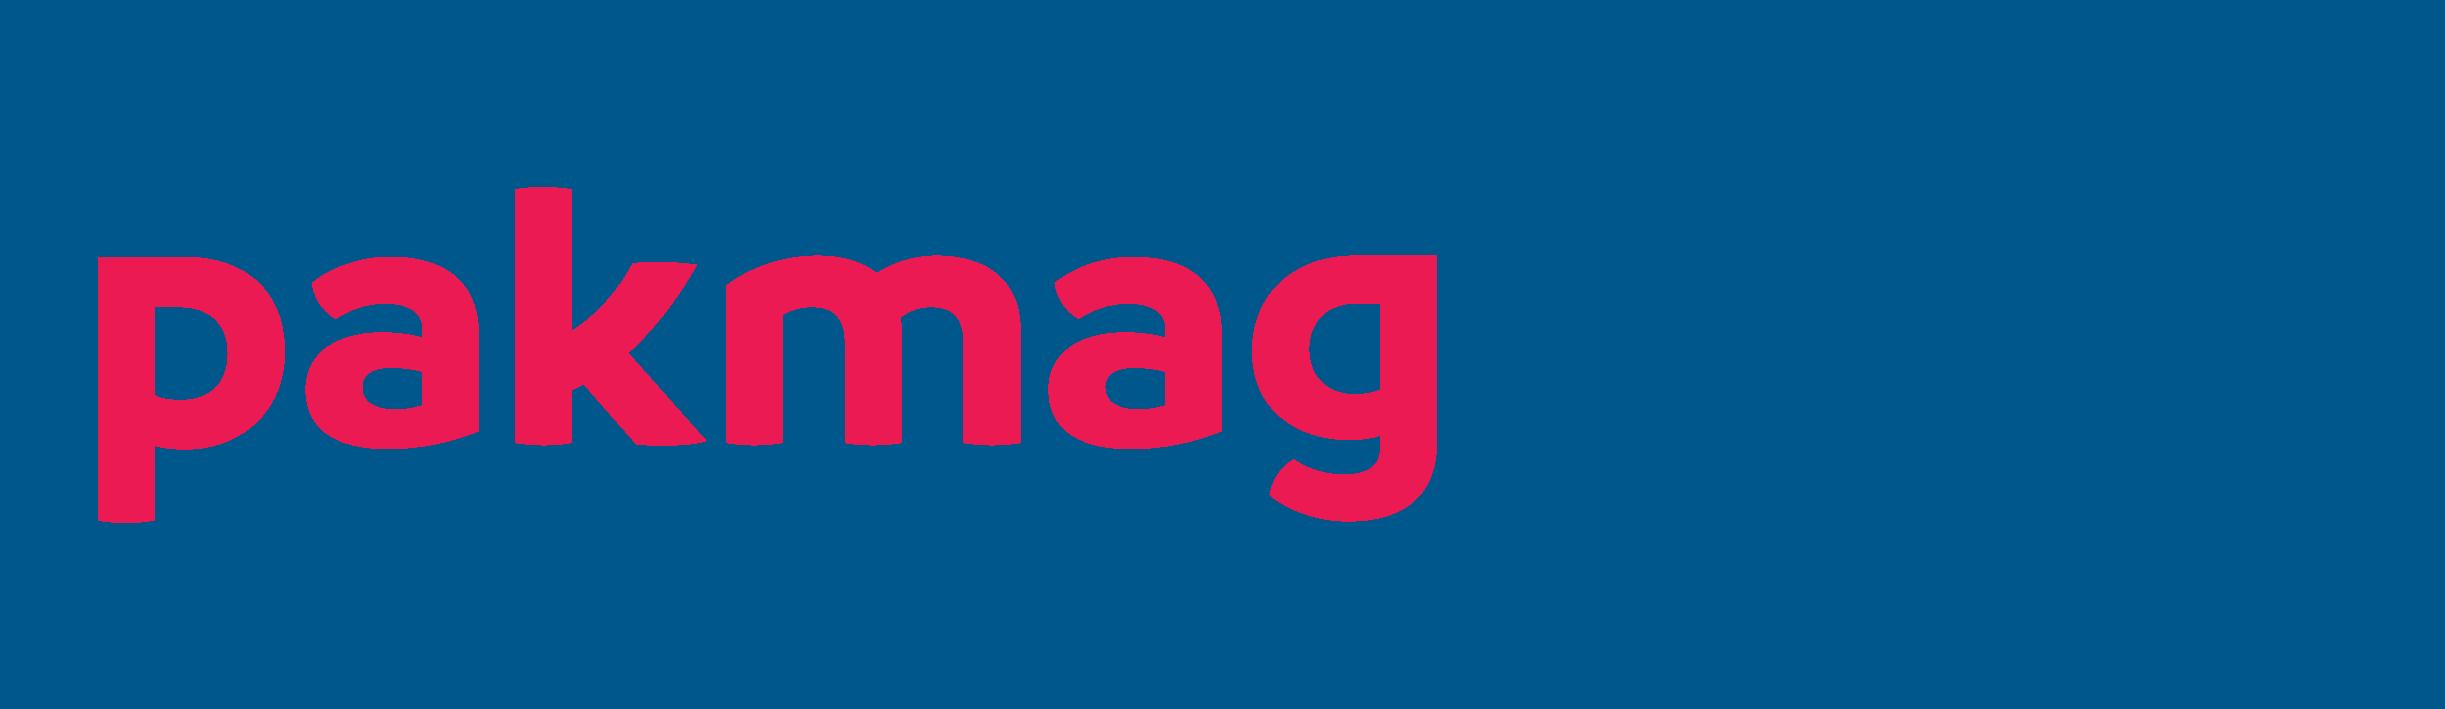 PakMag Cairns